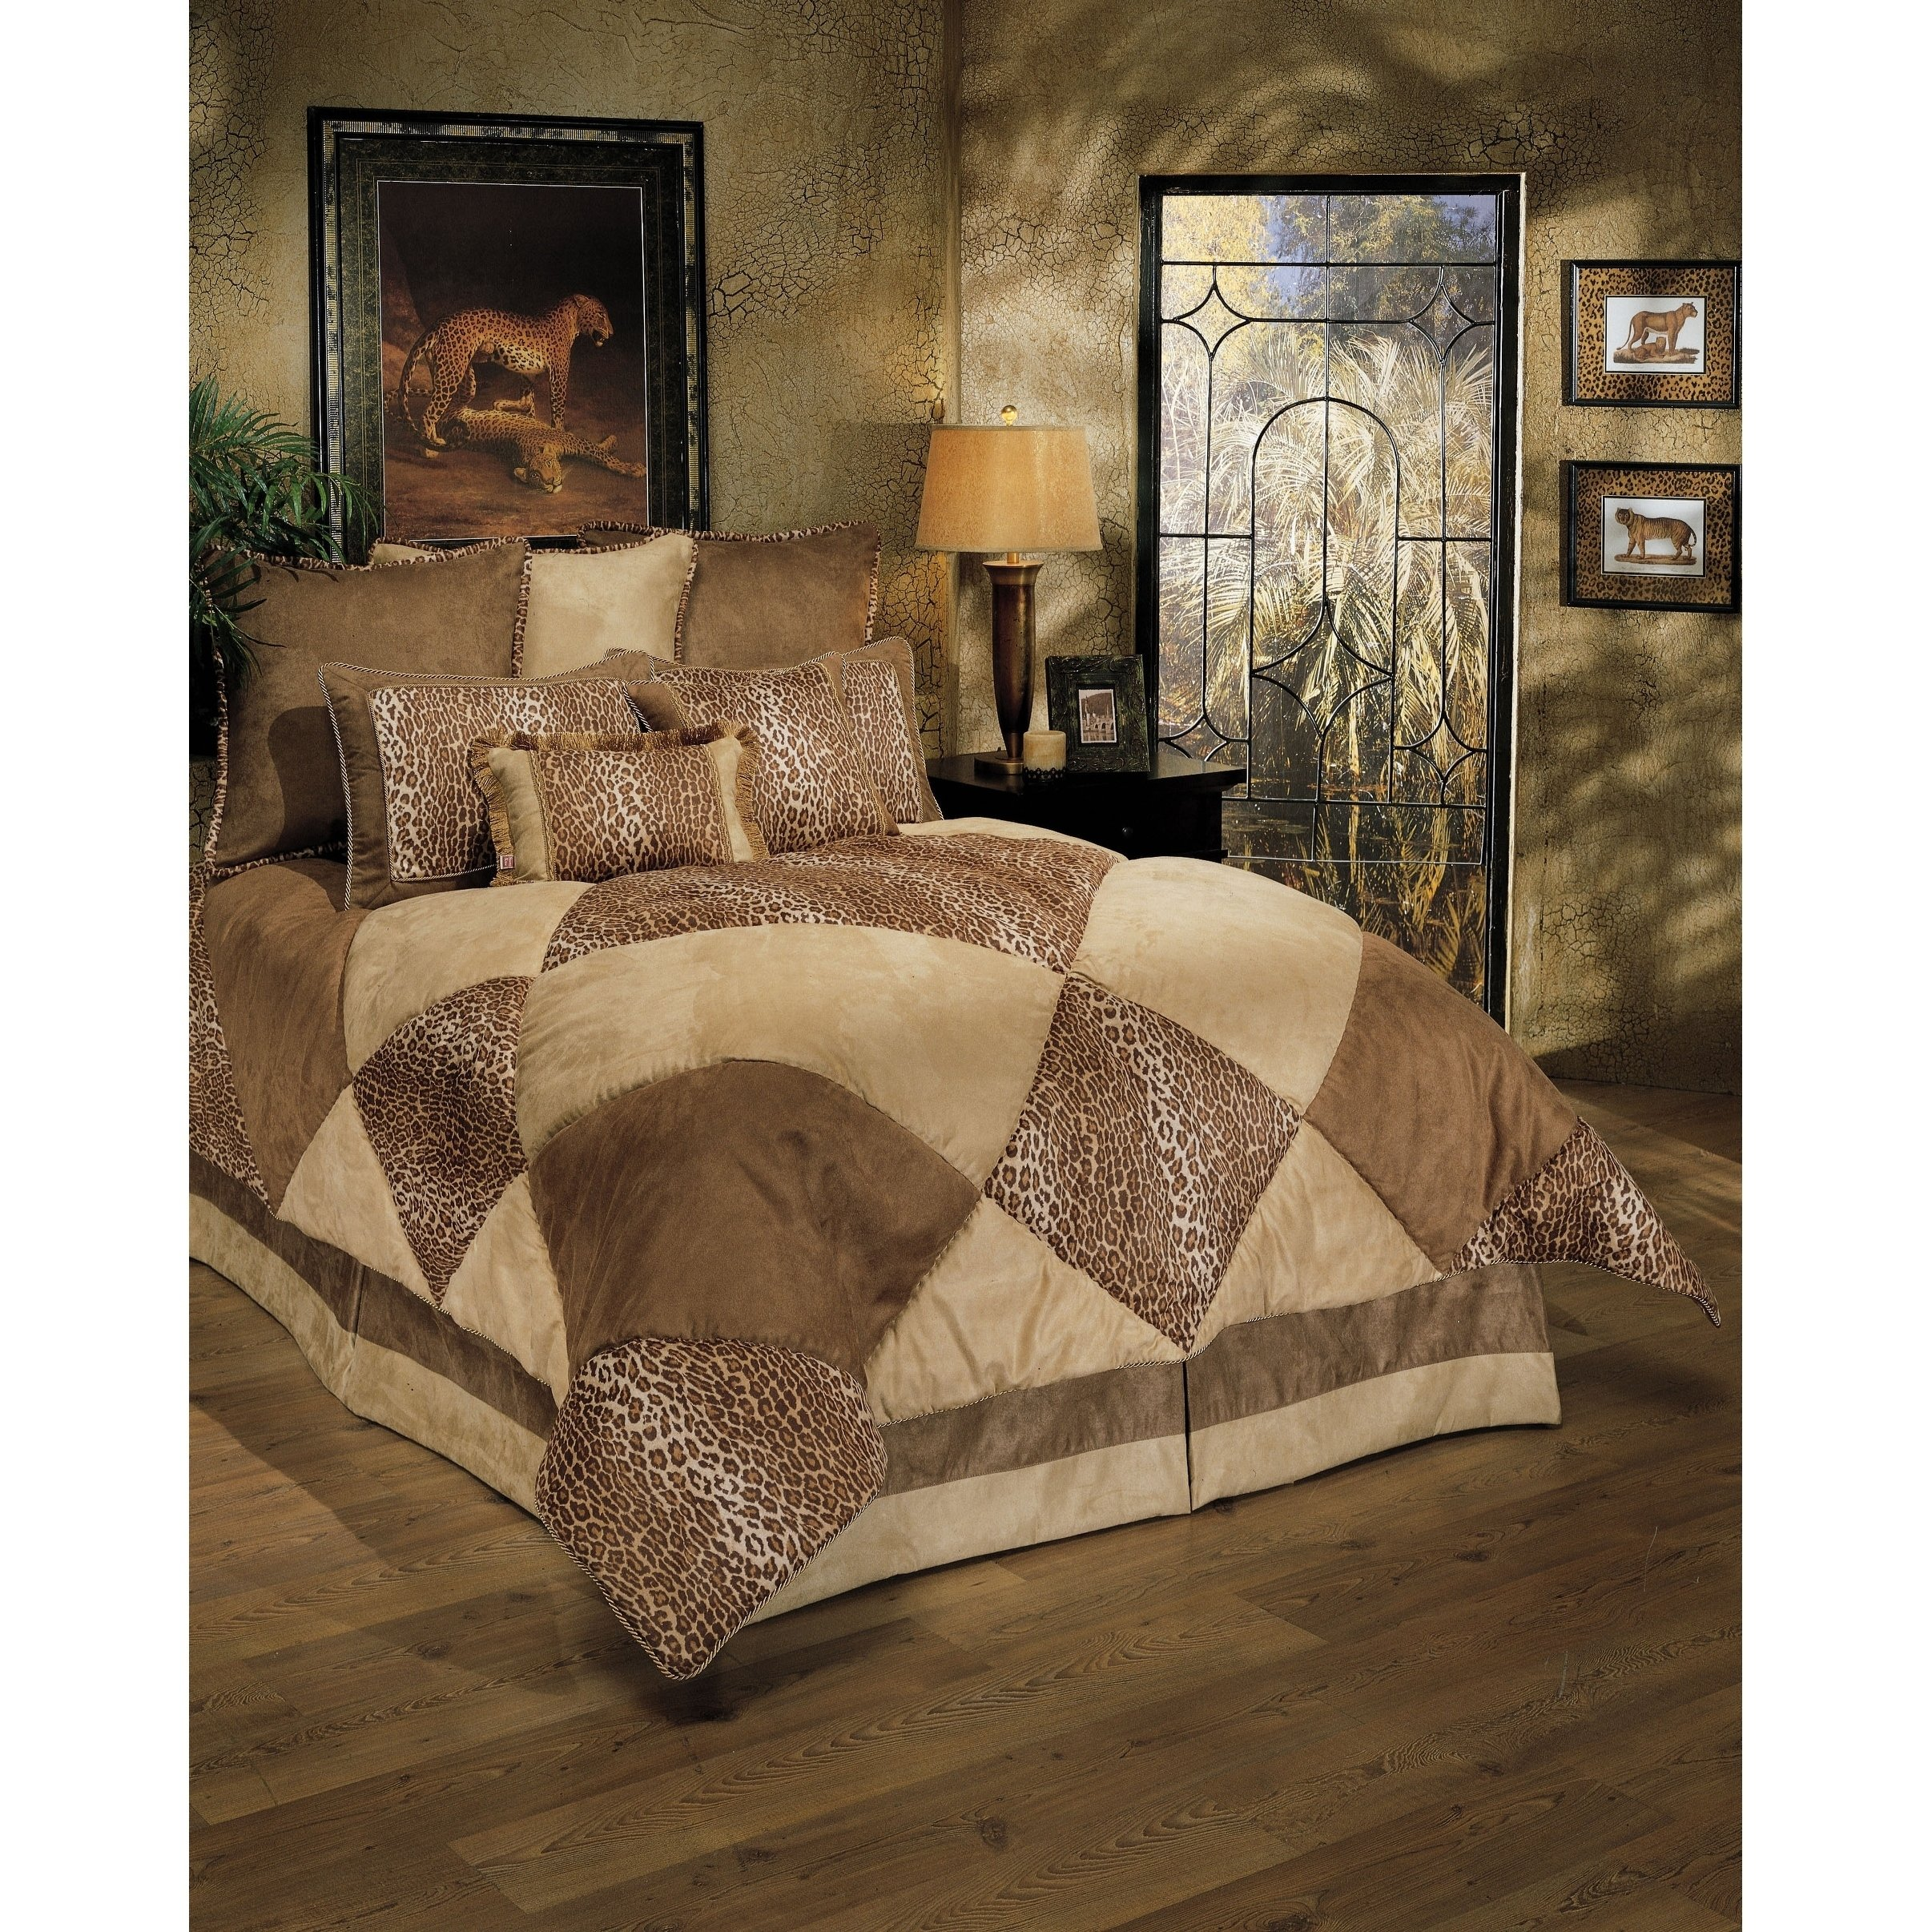 8 Piece Luxurious Safari Themed Comforter Set Cal King Size, Featuring Lush Geometric Diamonds Pattern Comfortable Bedding, Cheetah Animal Print, Unique Stylish Nature Inspired Bedroom Decoration, Tan